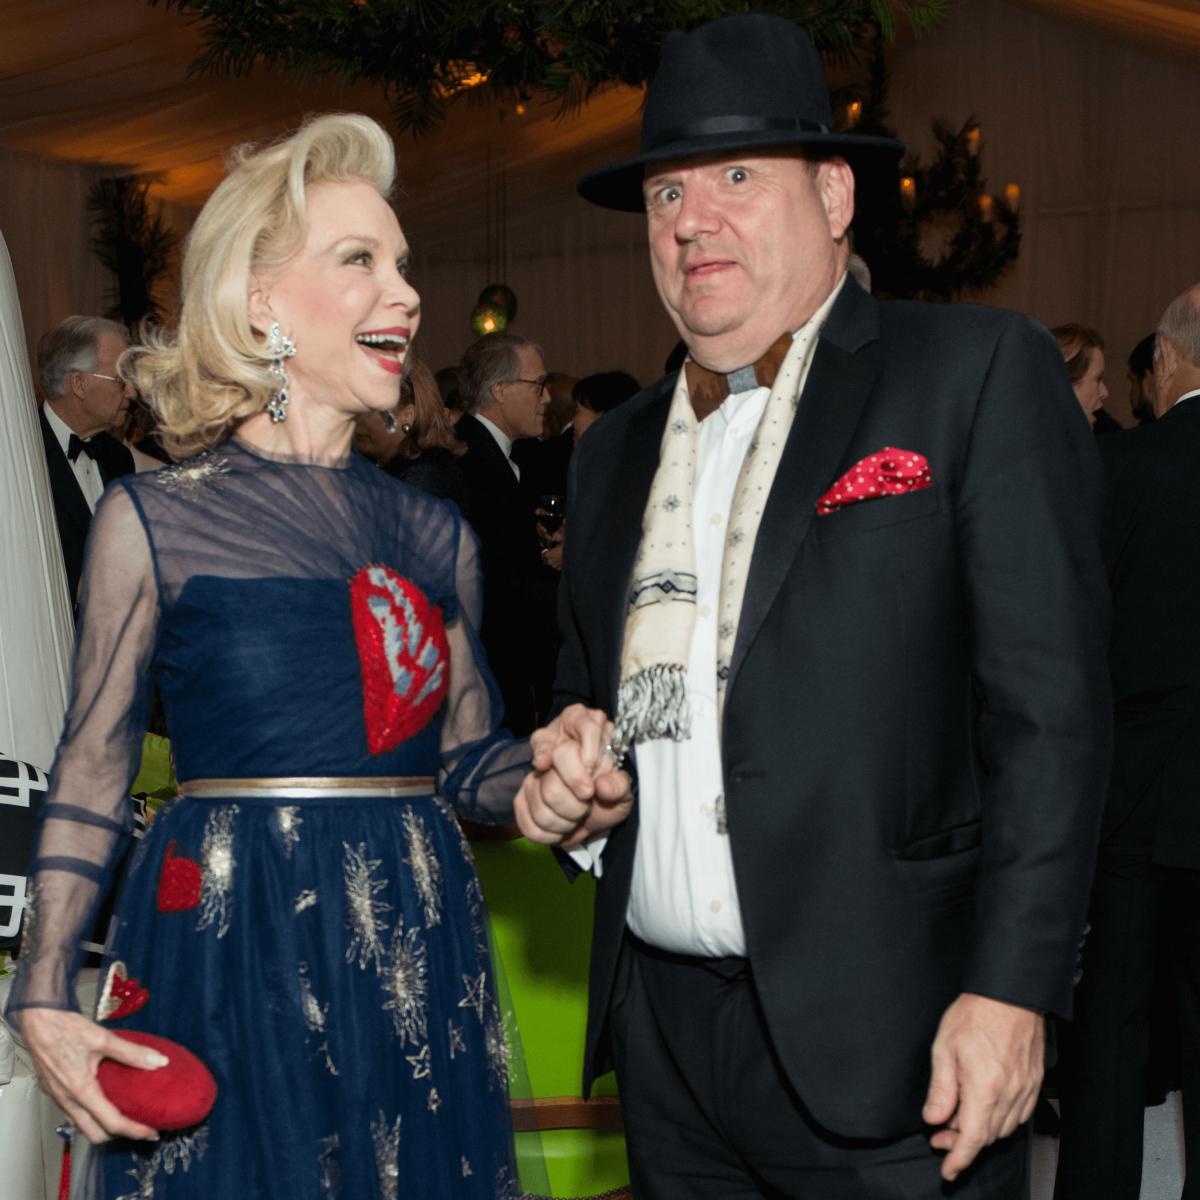 Jones Hall 50th Ball, Lynn Wyatt and Perryn Leech